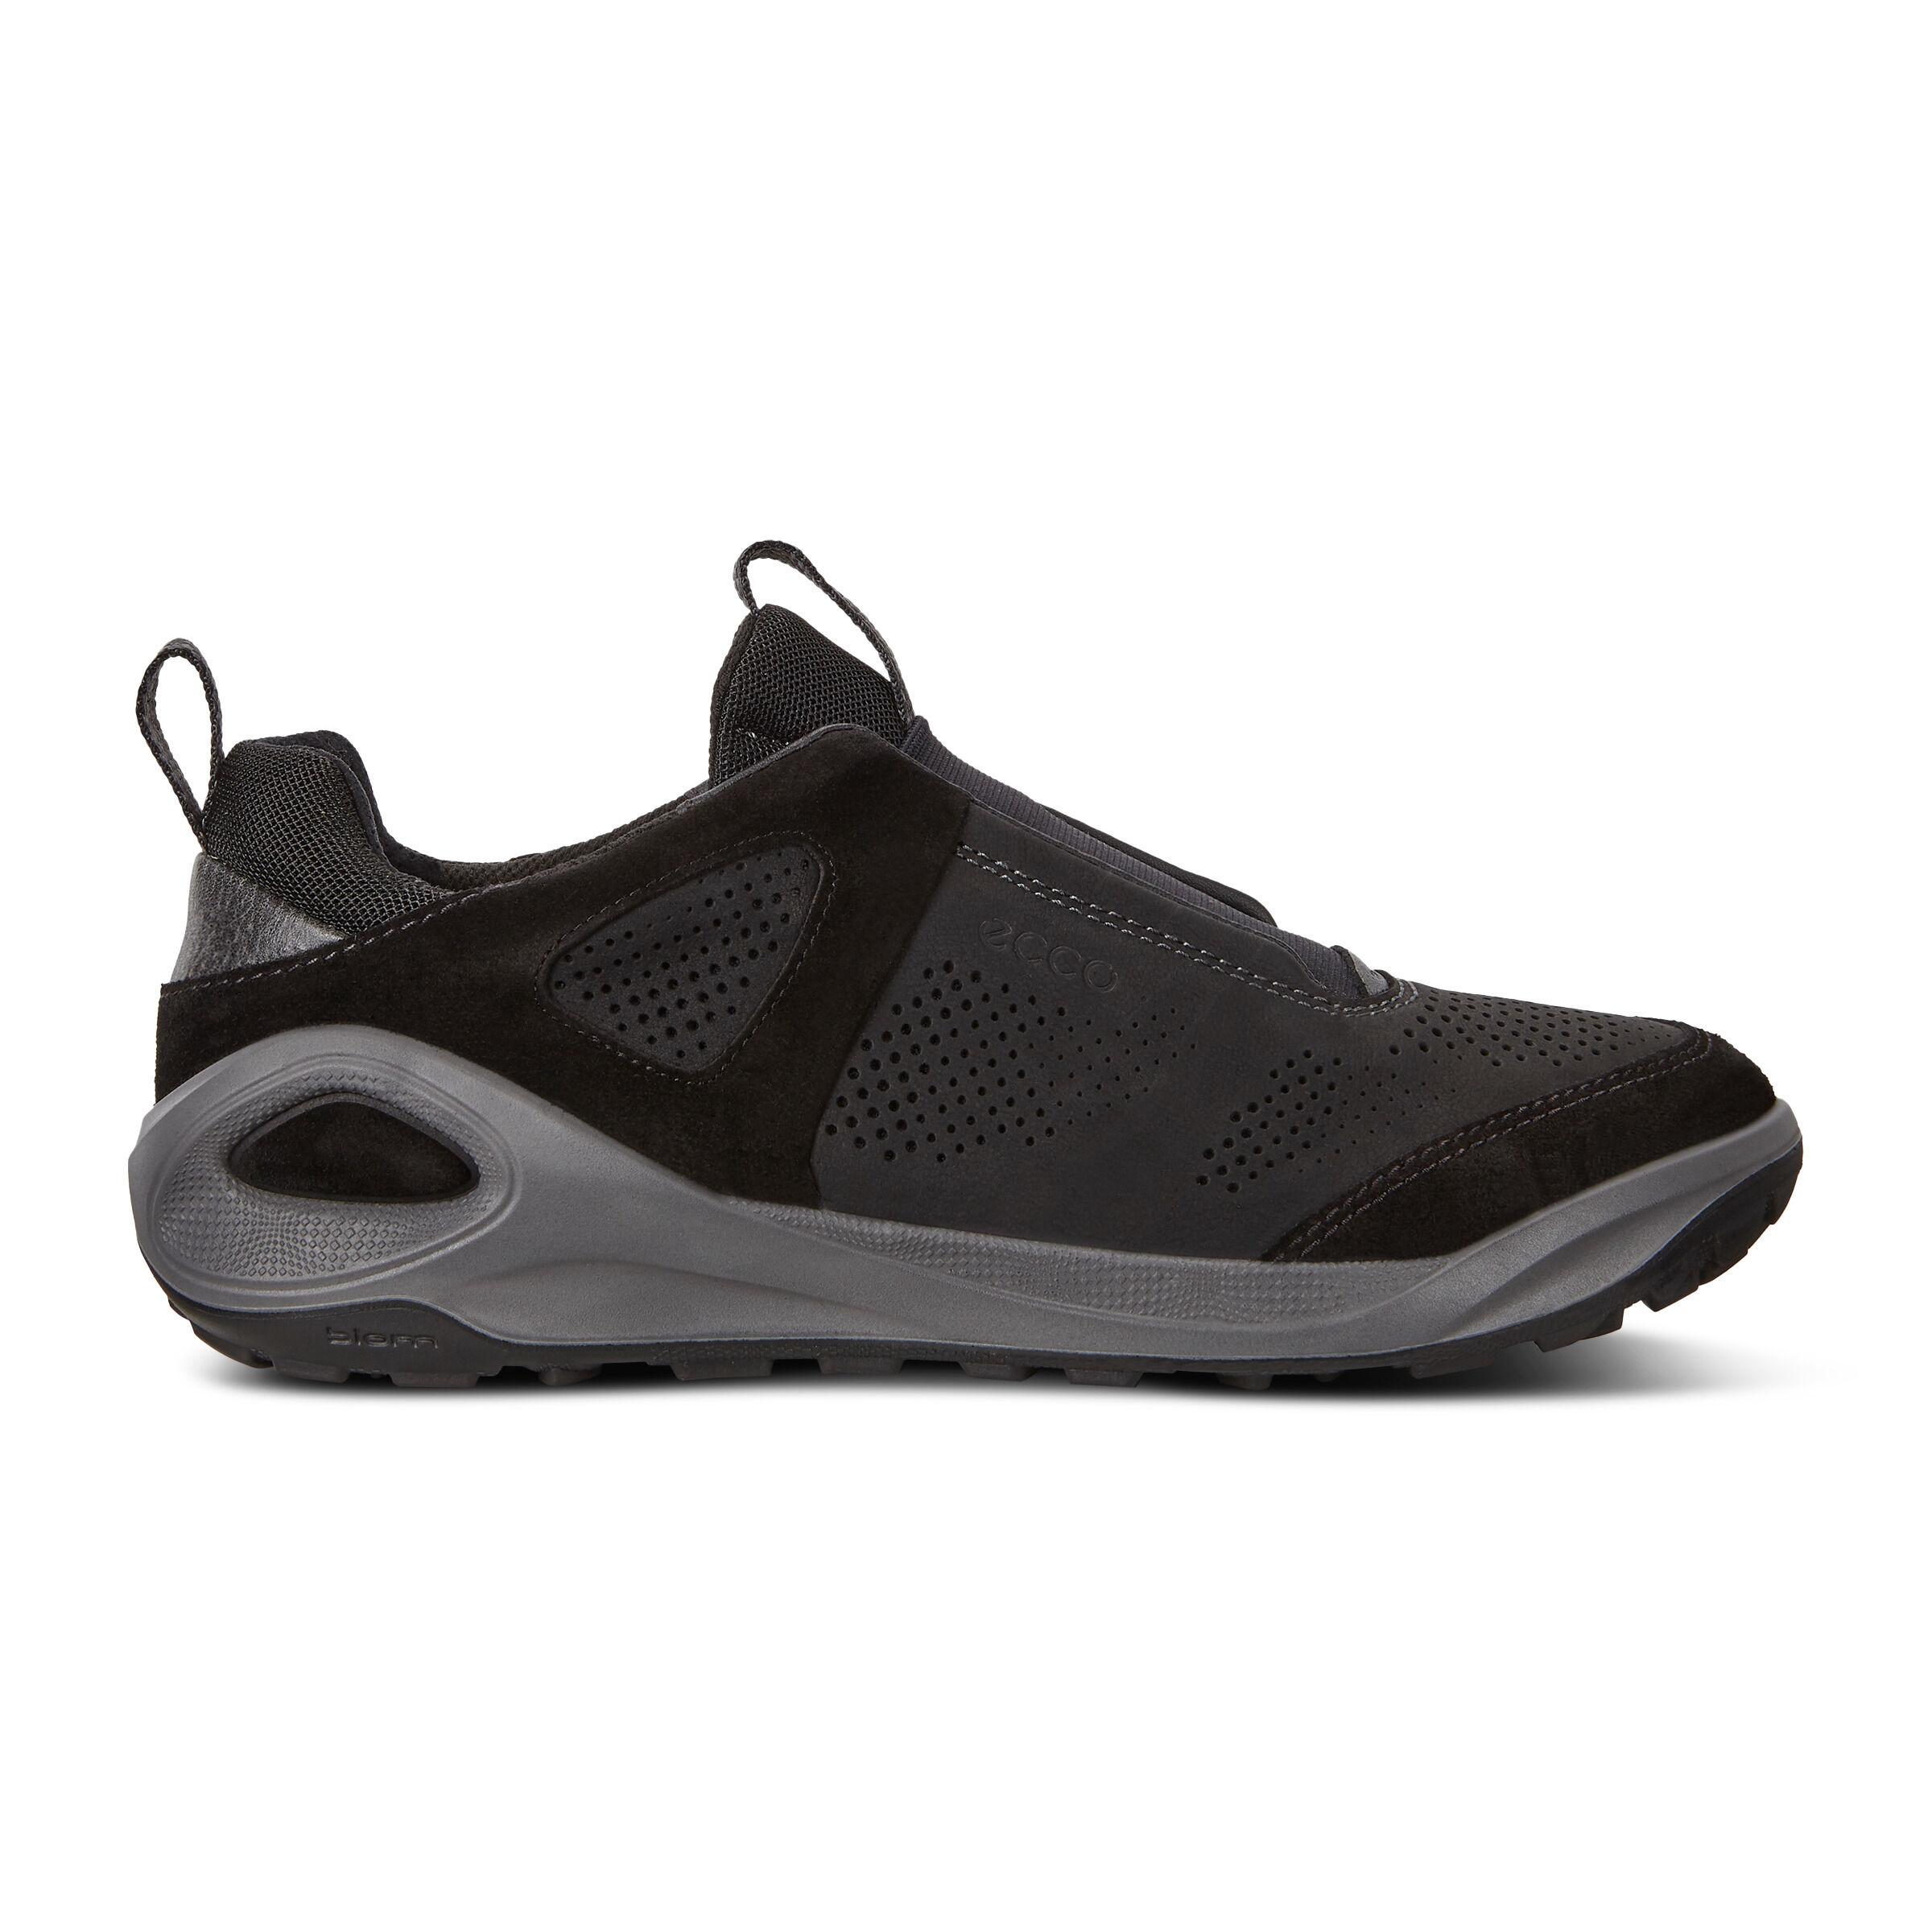 ECCO BIOM 2go Mens Sneaker